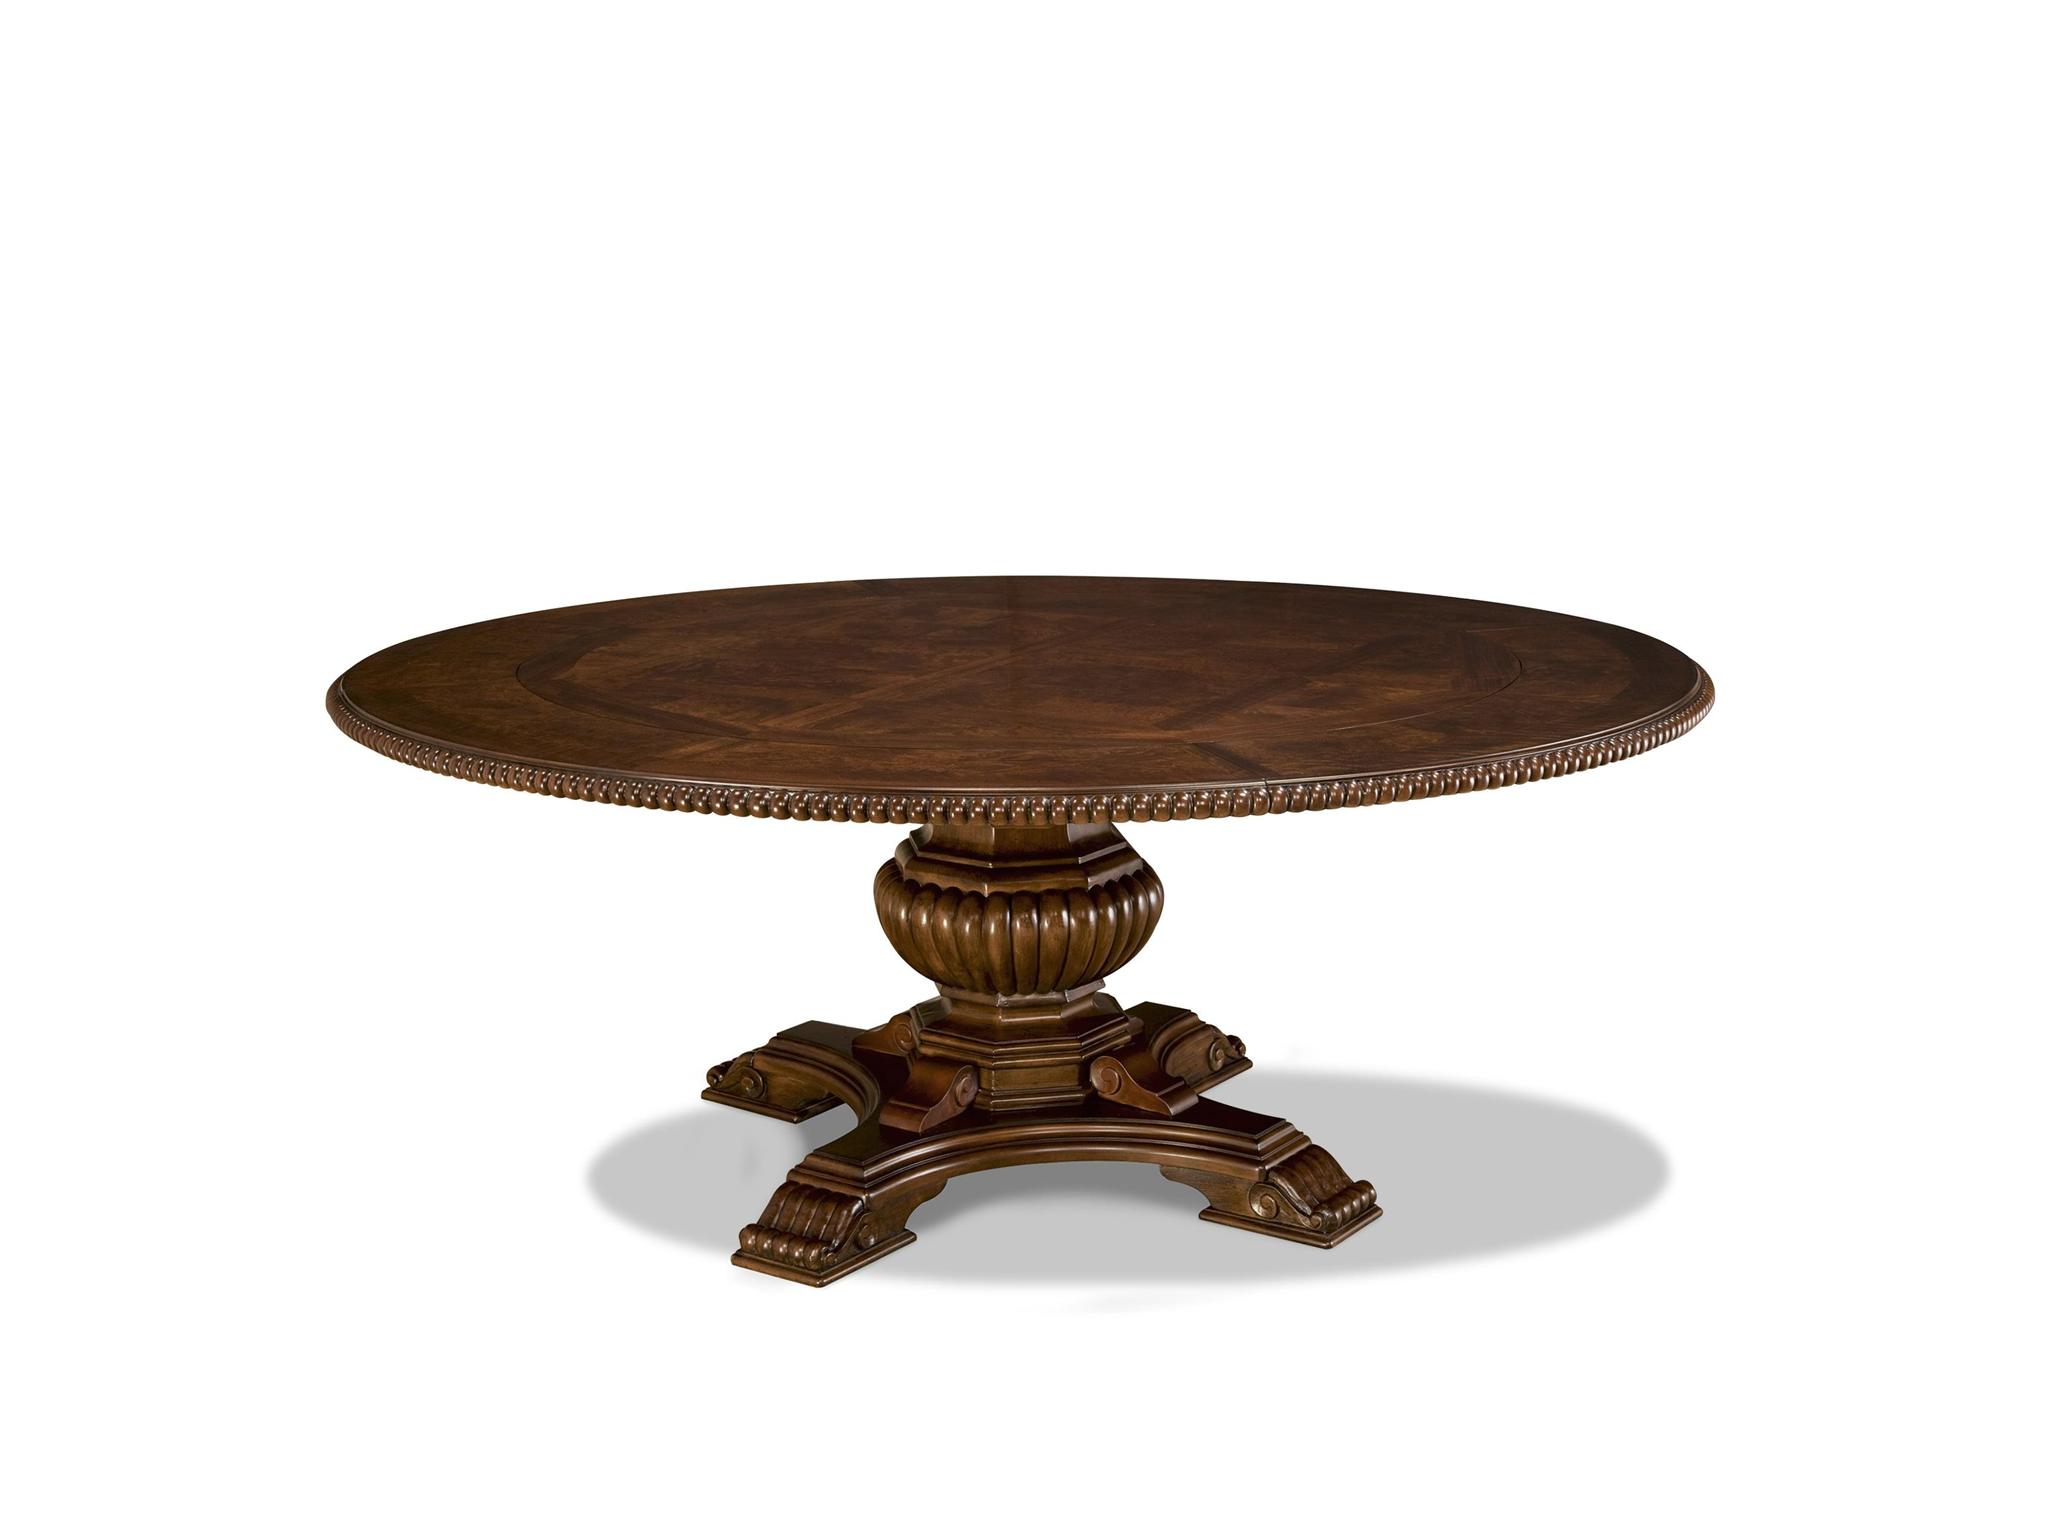 Universal Furniture Villa Cortina Round Dining Table